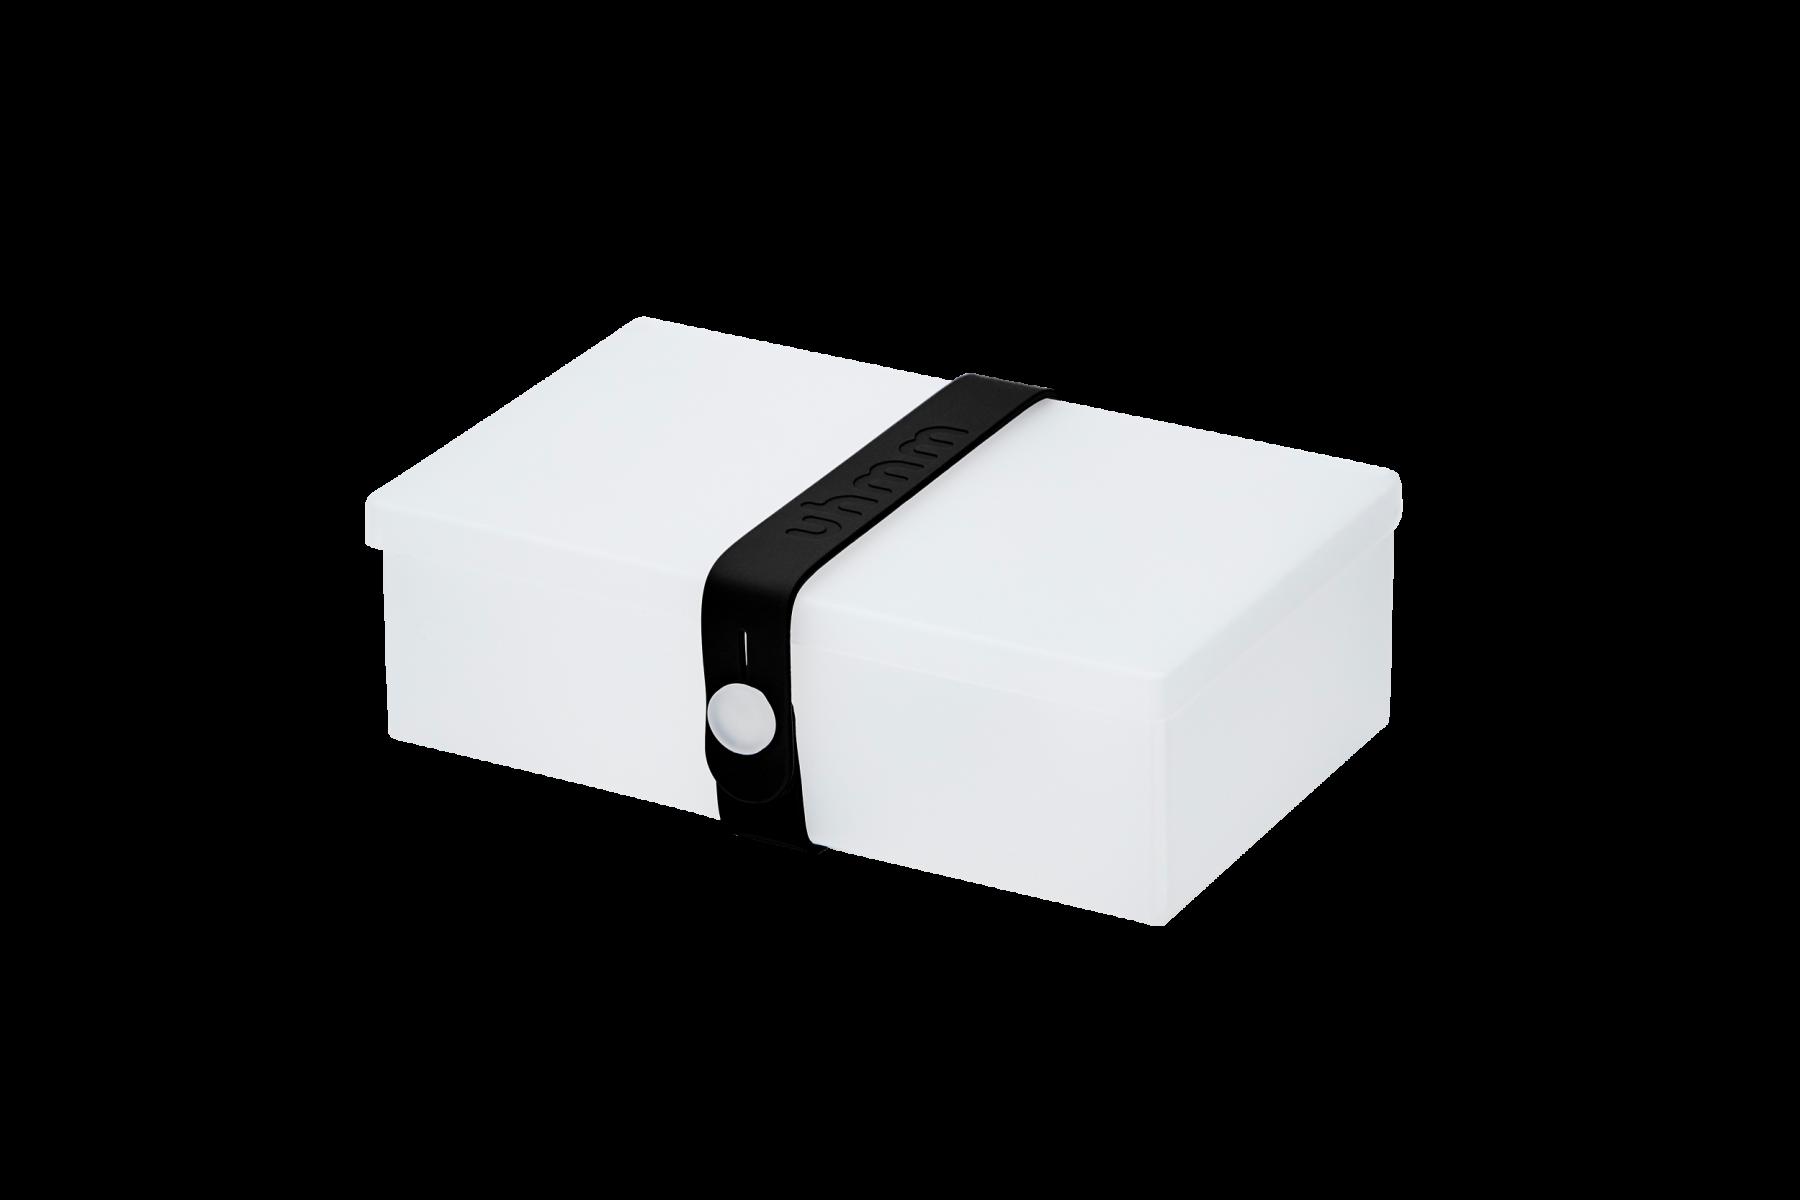 No. 01 Transparent Box/Black Strap - uhmmbox.com